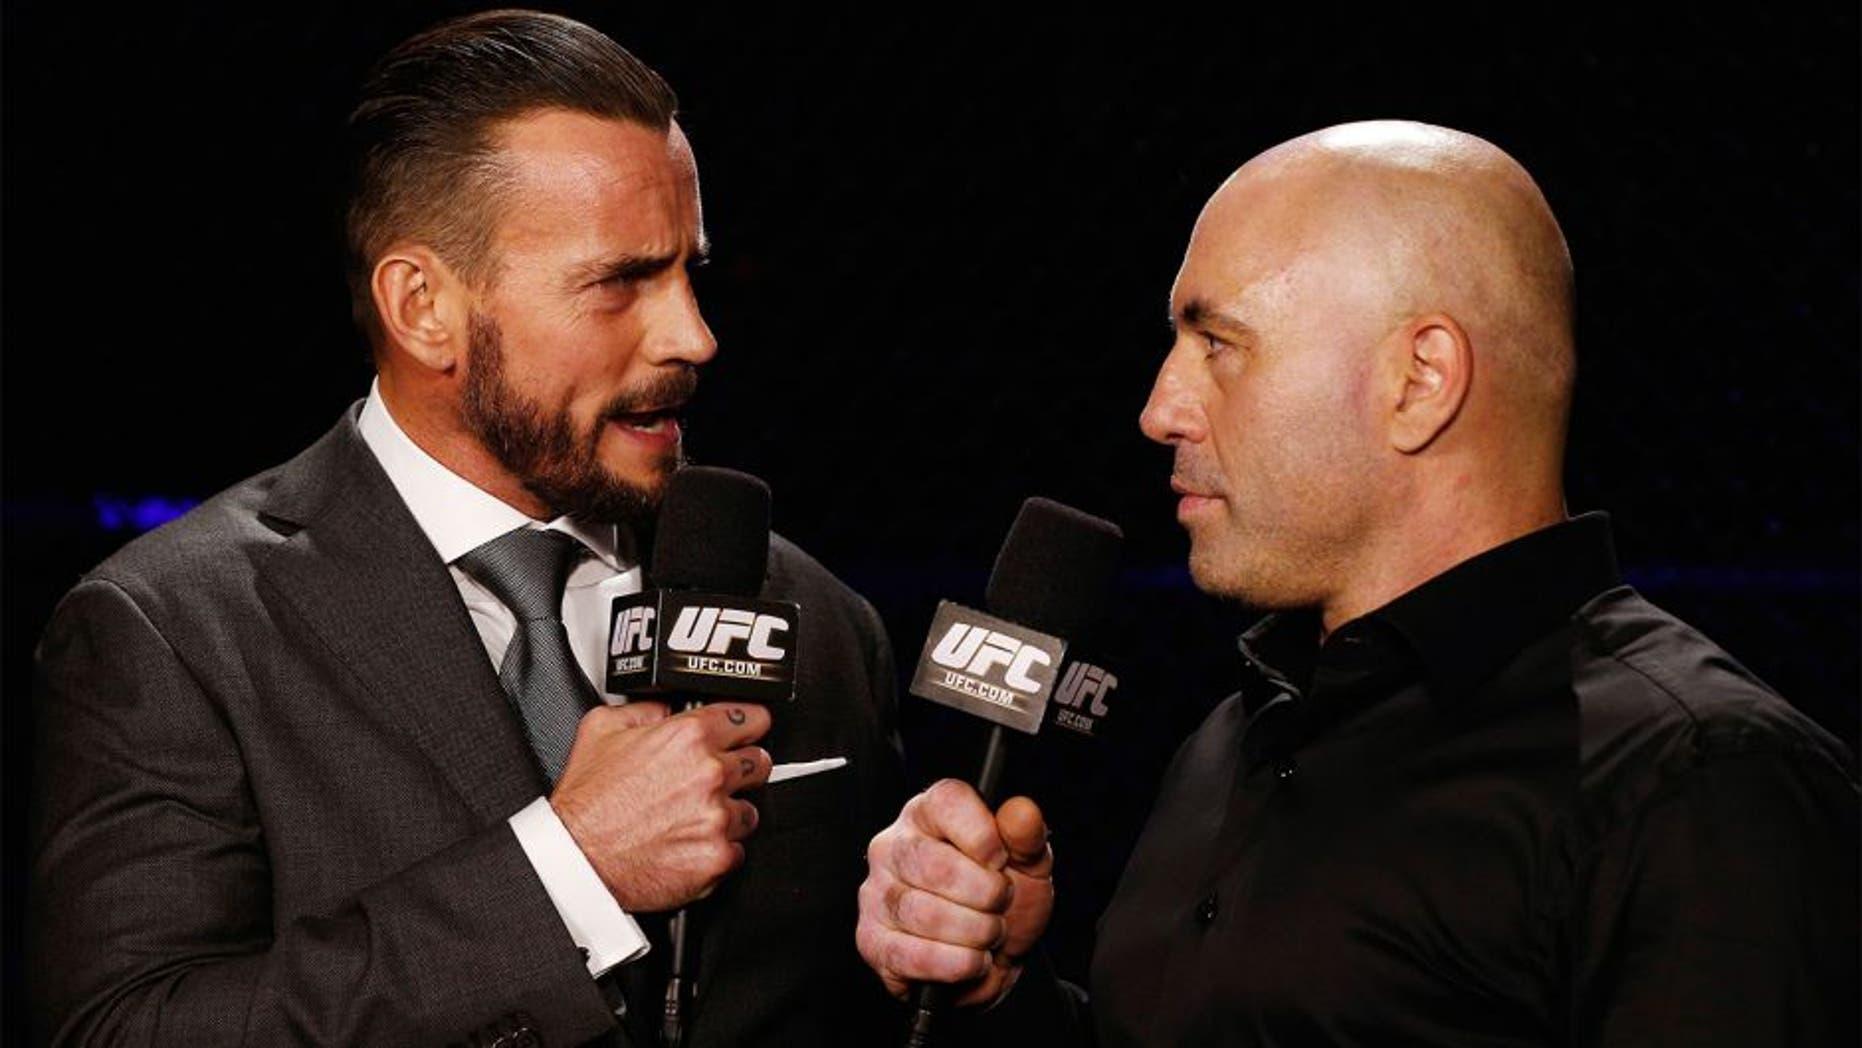 "LAS VEGAS, NV - DECEMBER 06: (L-R) Phil ""CM Punk"" Brooks speaks with Joe Rogan during the UFC 181 event inside the Mandalay Bay Events Center on December 6, 2014 in Las Vegas, Nevada. (Photo by Josh Hedges/Zuffa LLC/Zuffa LLC via Getty Images)"